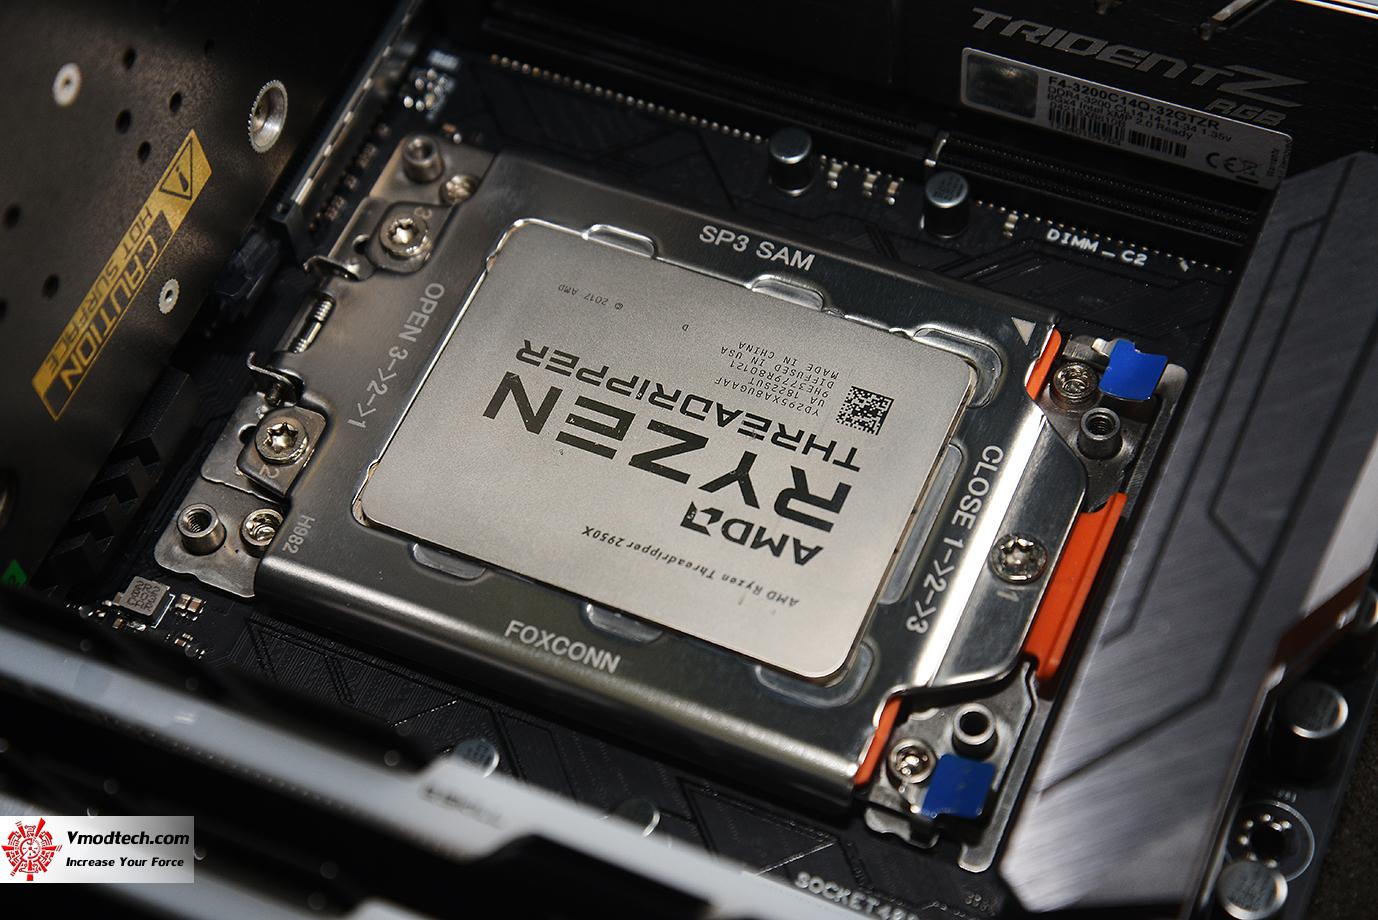 dsc 6391 AMD RYZEN THREADRIPPER 2950X PROCESSOR REVIEW